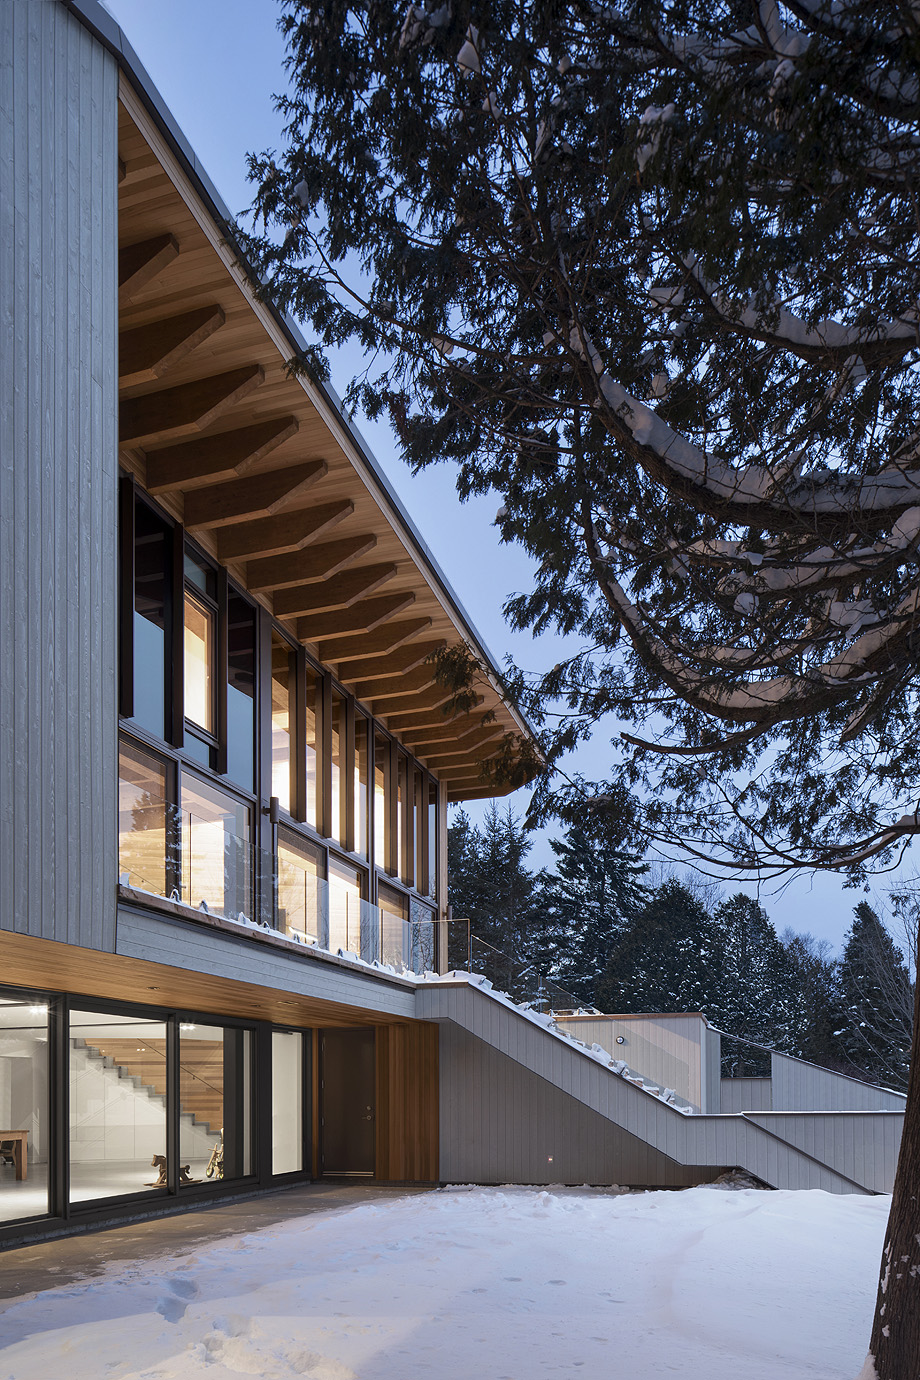 casa accostee de bourgeois lechasseur architects - foto adrien williams (16)